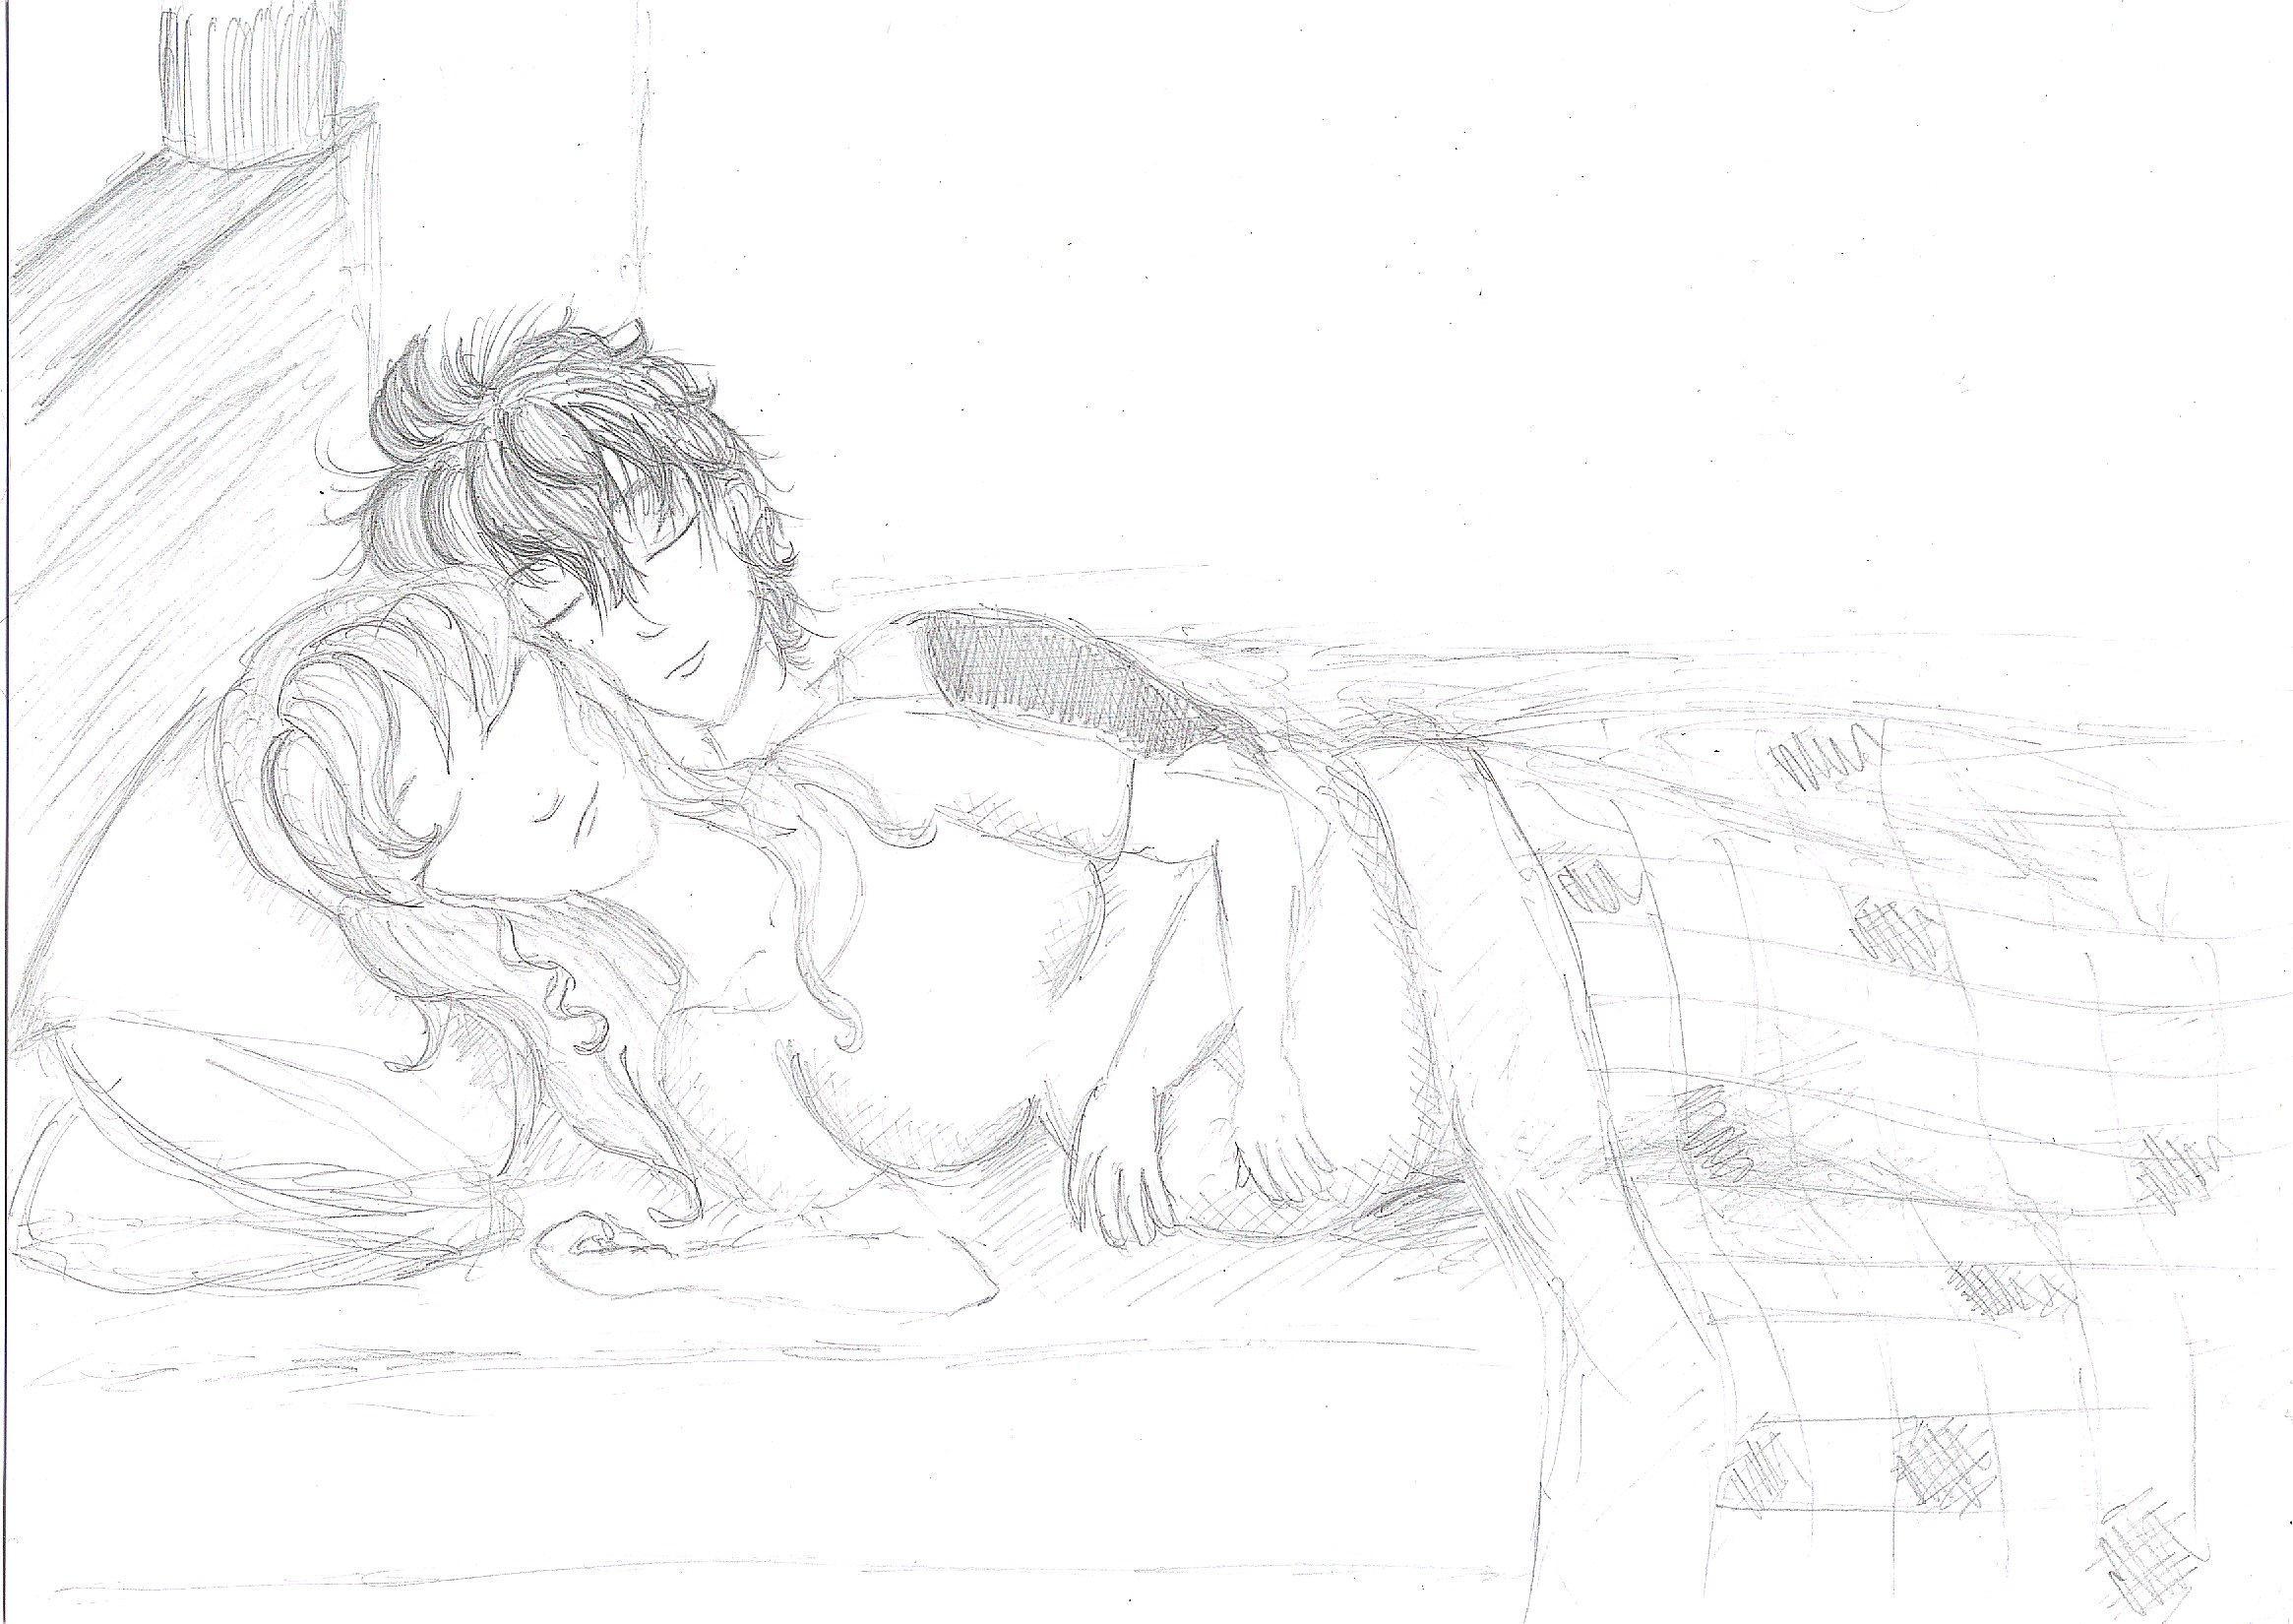 Sleeping Couple by mithua on DeviantArt